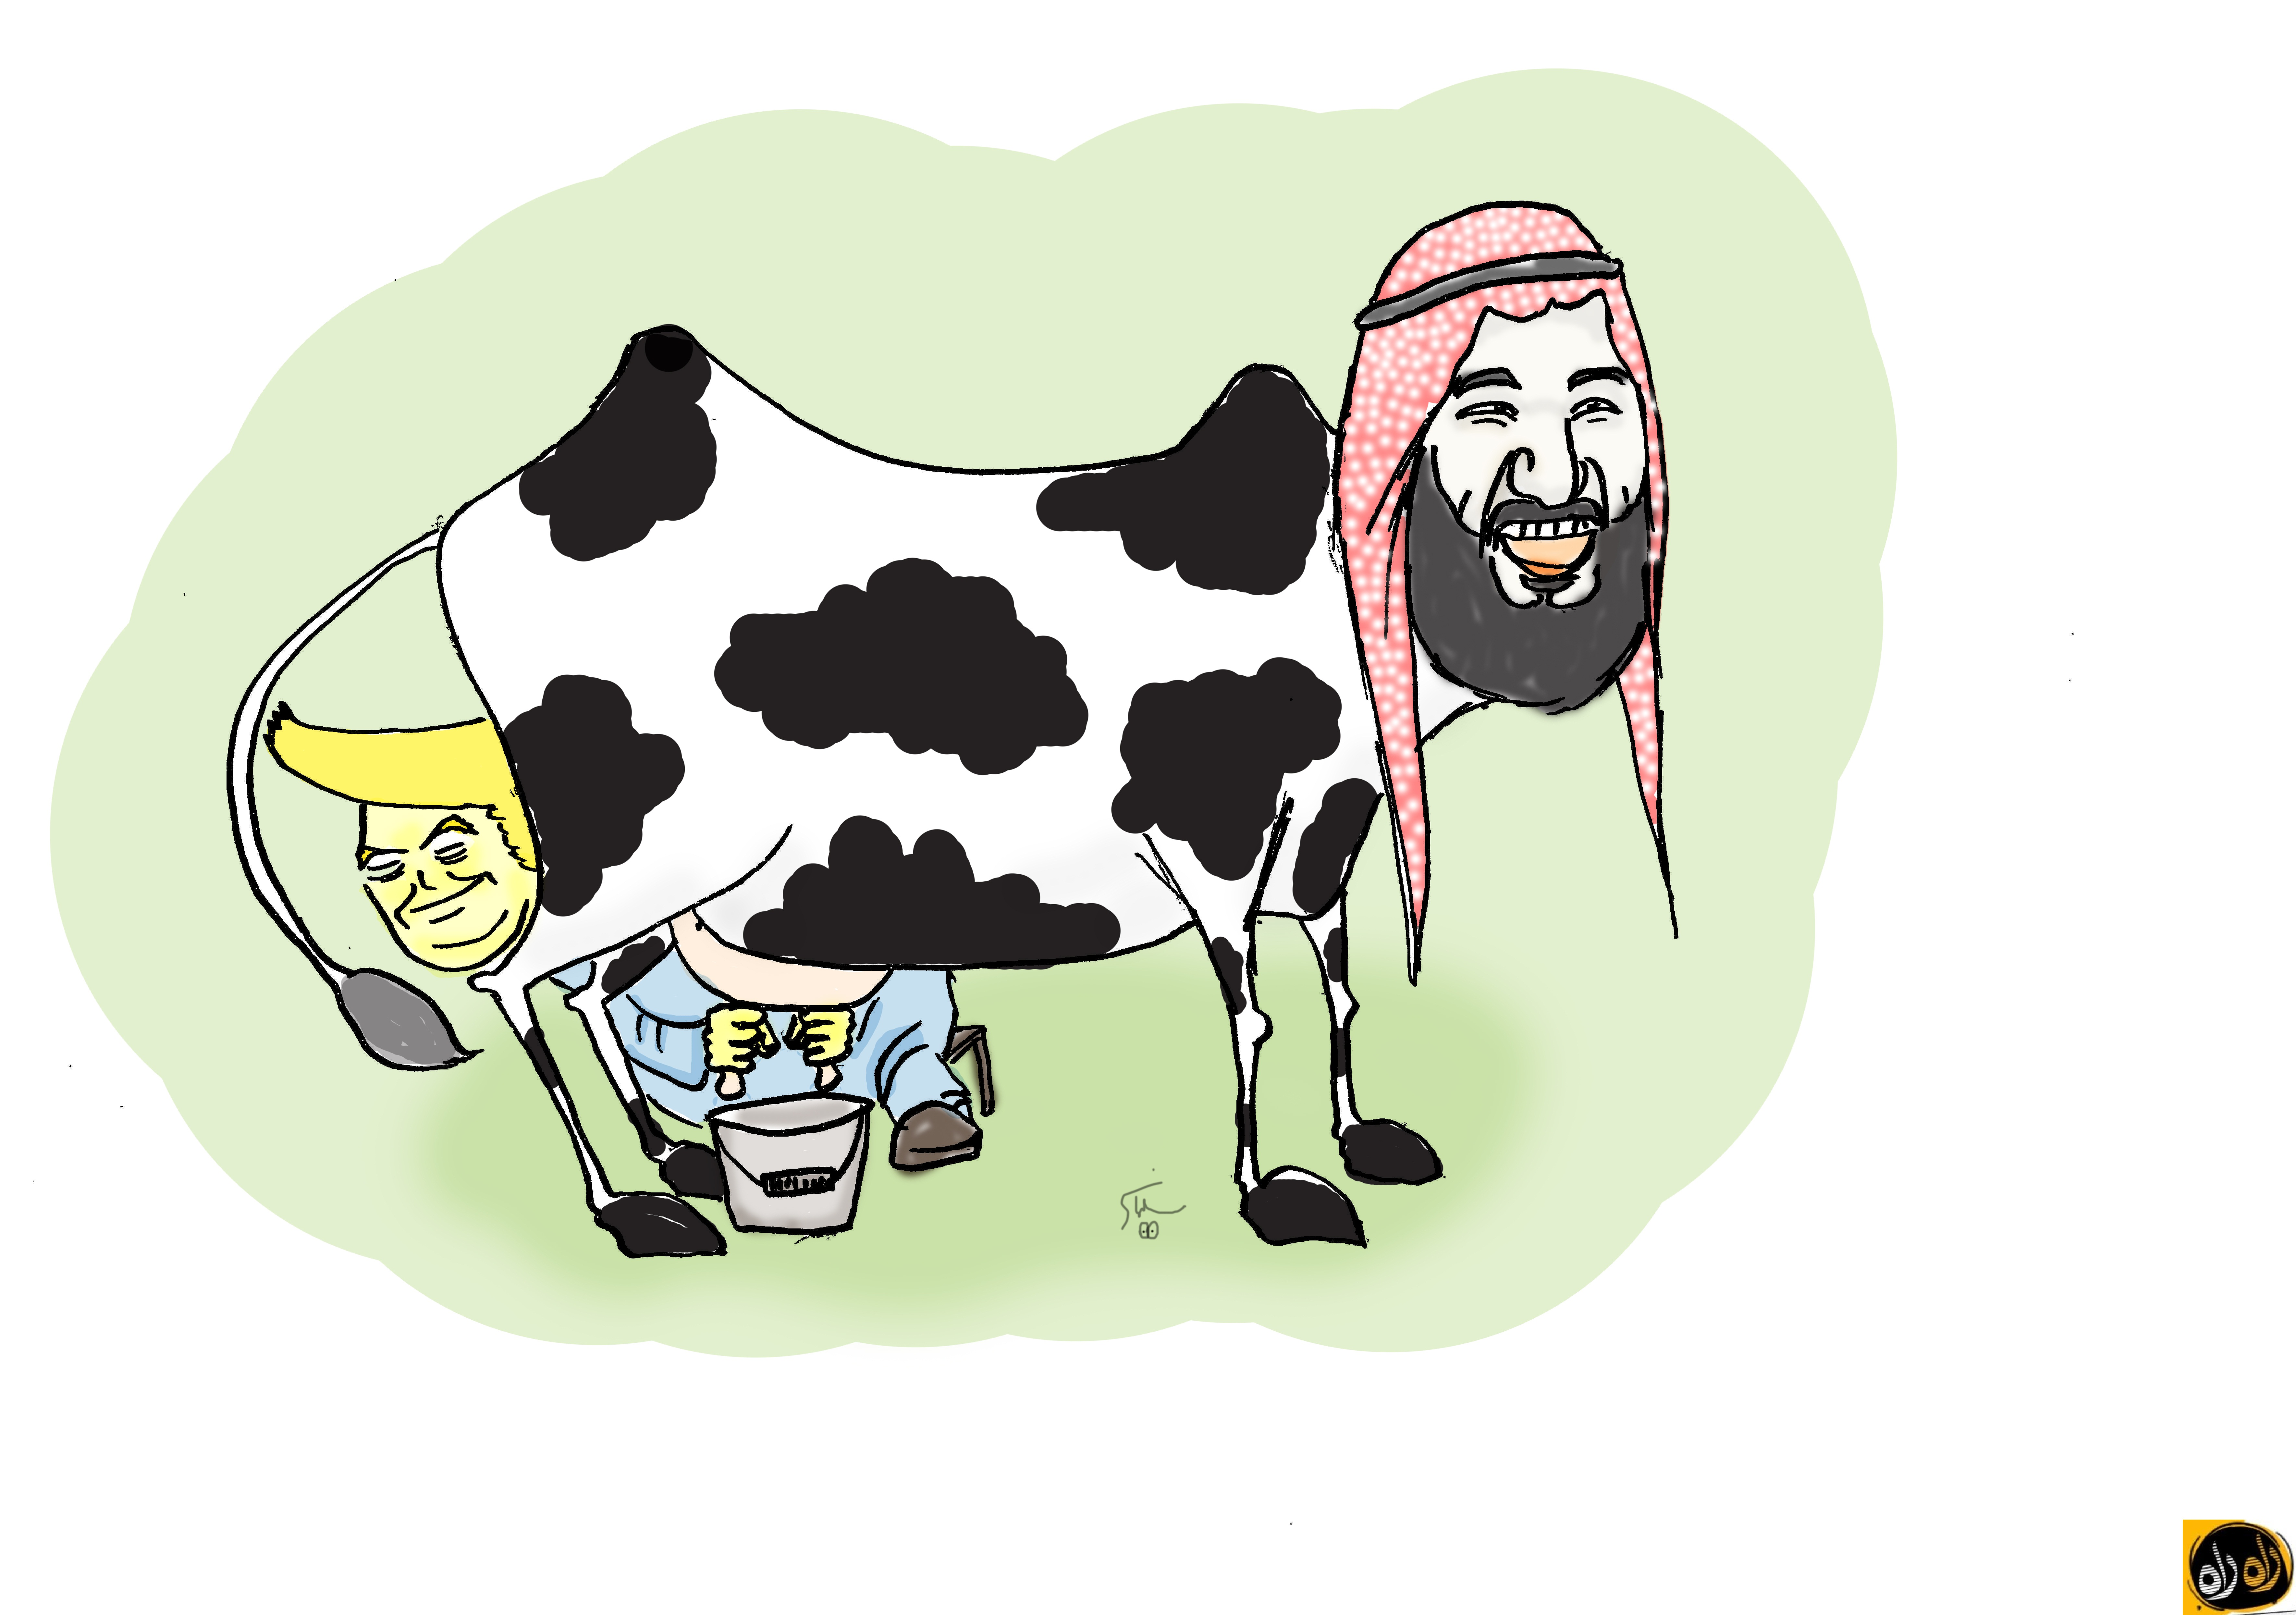 گاو شیرده